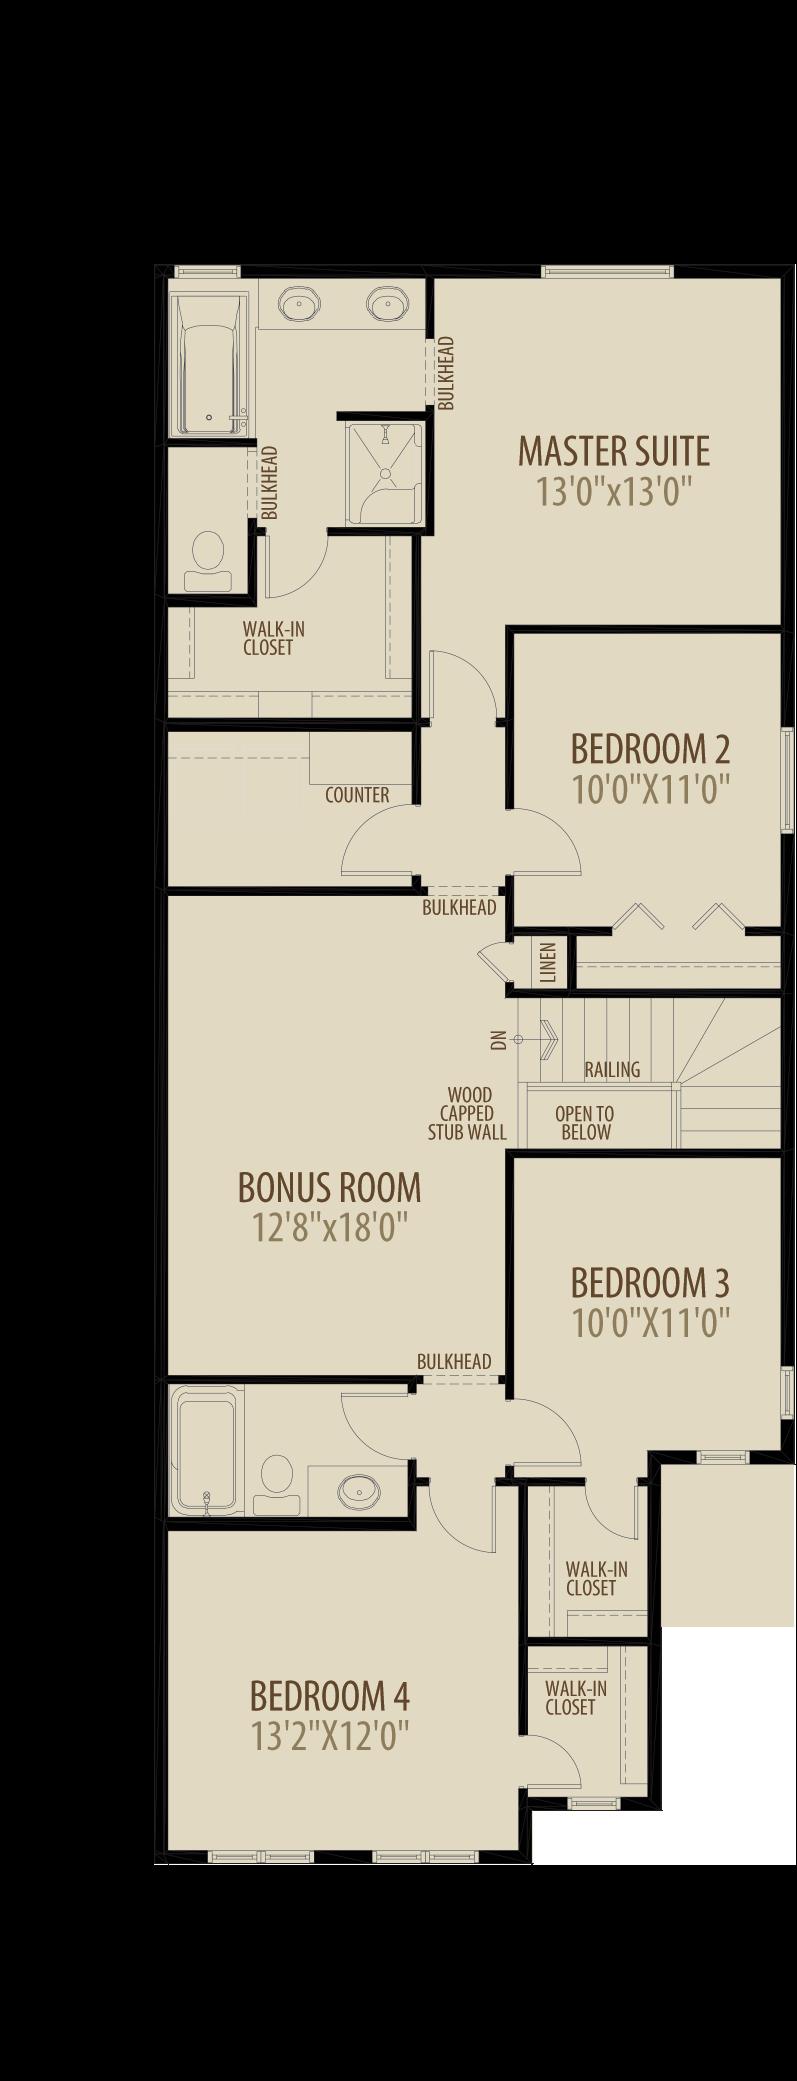 Option 8 4th Bed Central Bonus Room 2 adds 236 sq ft